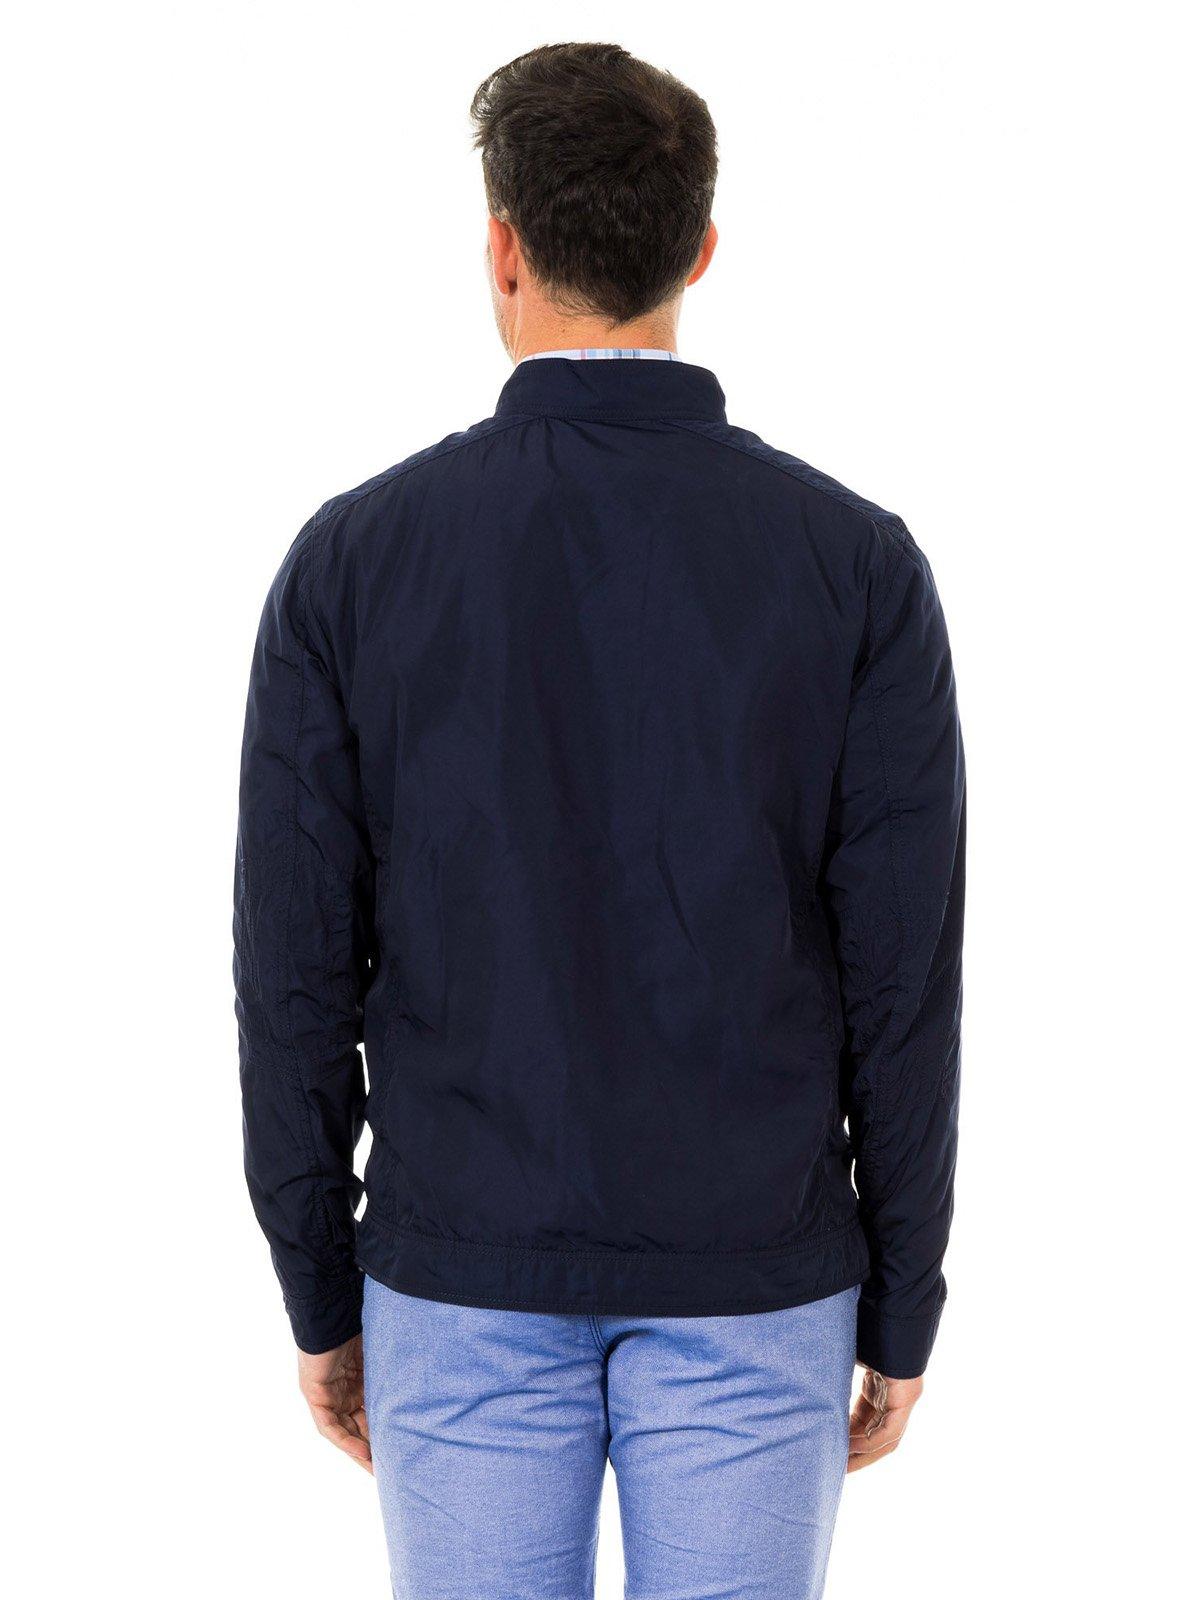 Куртка темно-синяя | 2421239 | фото 3